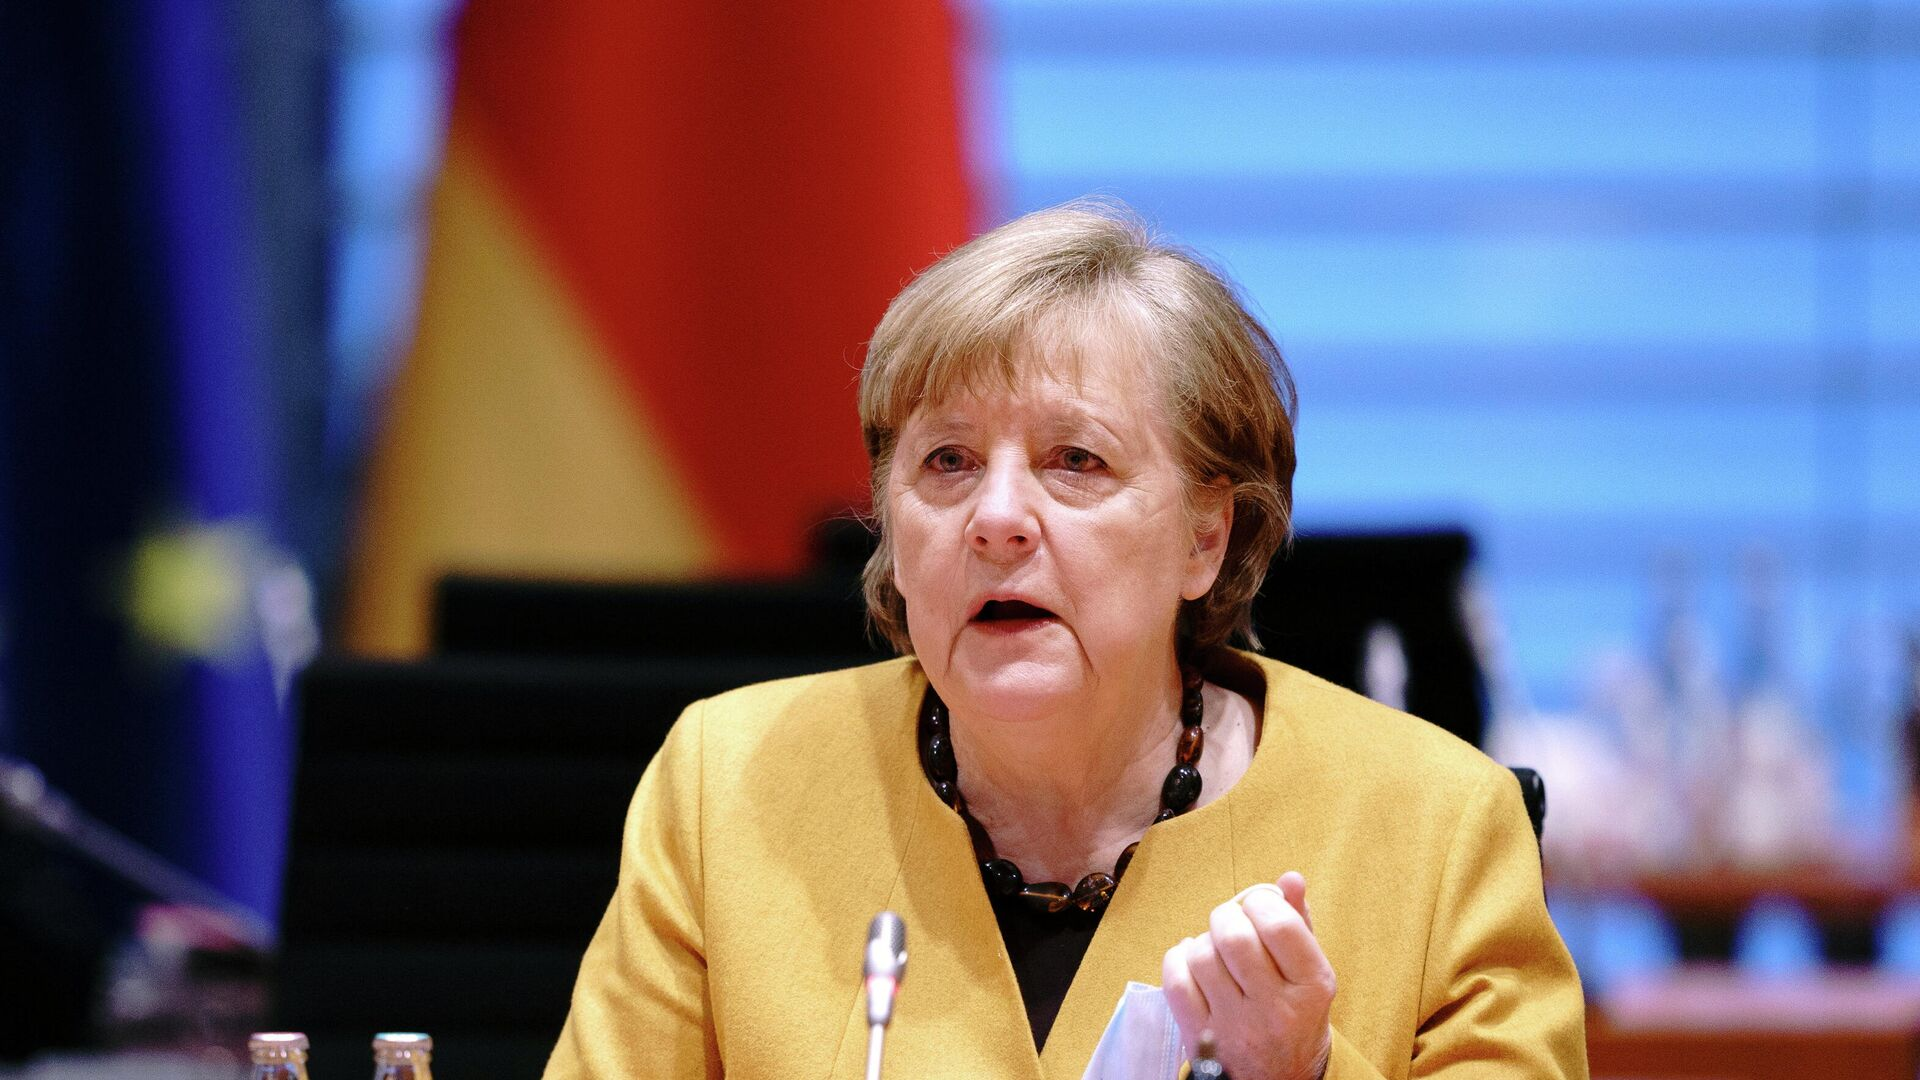 Angela Merkel, canciller alemana - Sputnik Mundo, 1920, 20.04.2021